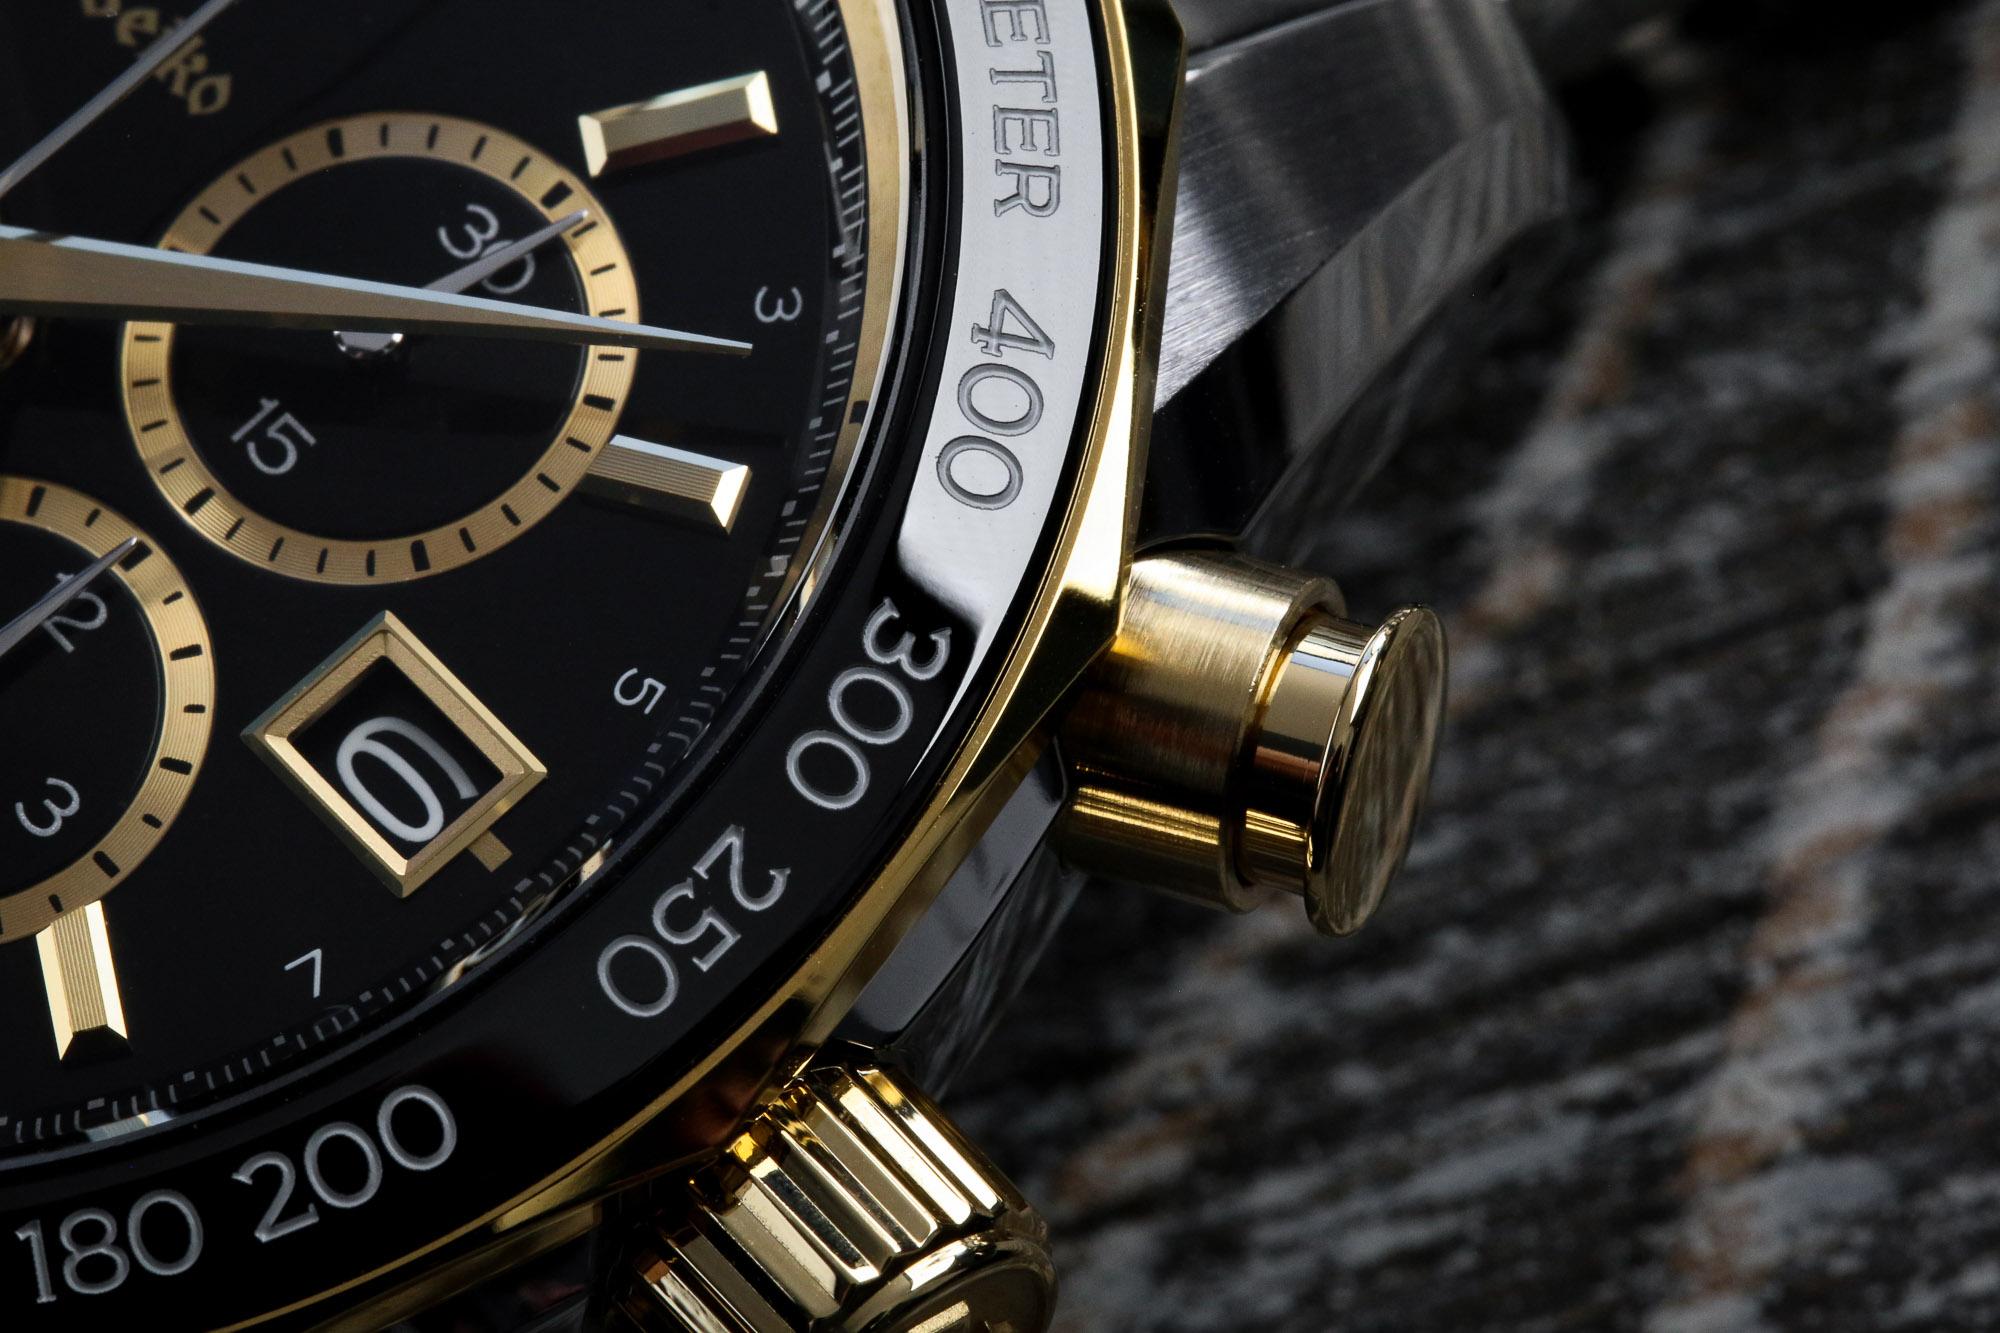 Macro detail of chronograph pusher and bezel SBGC240